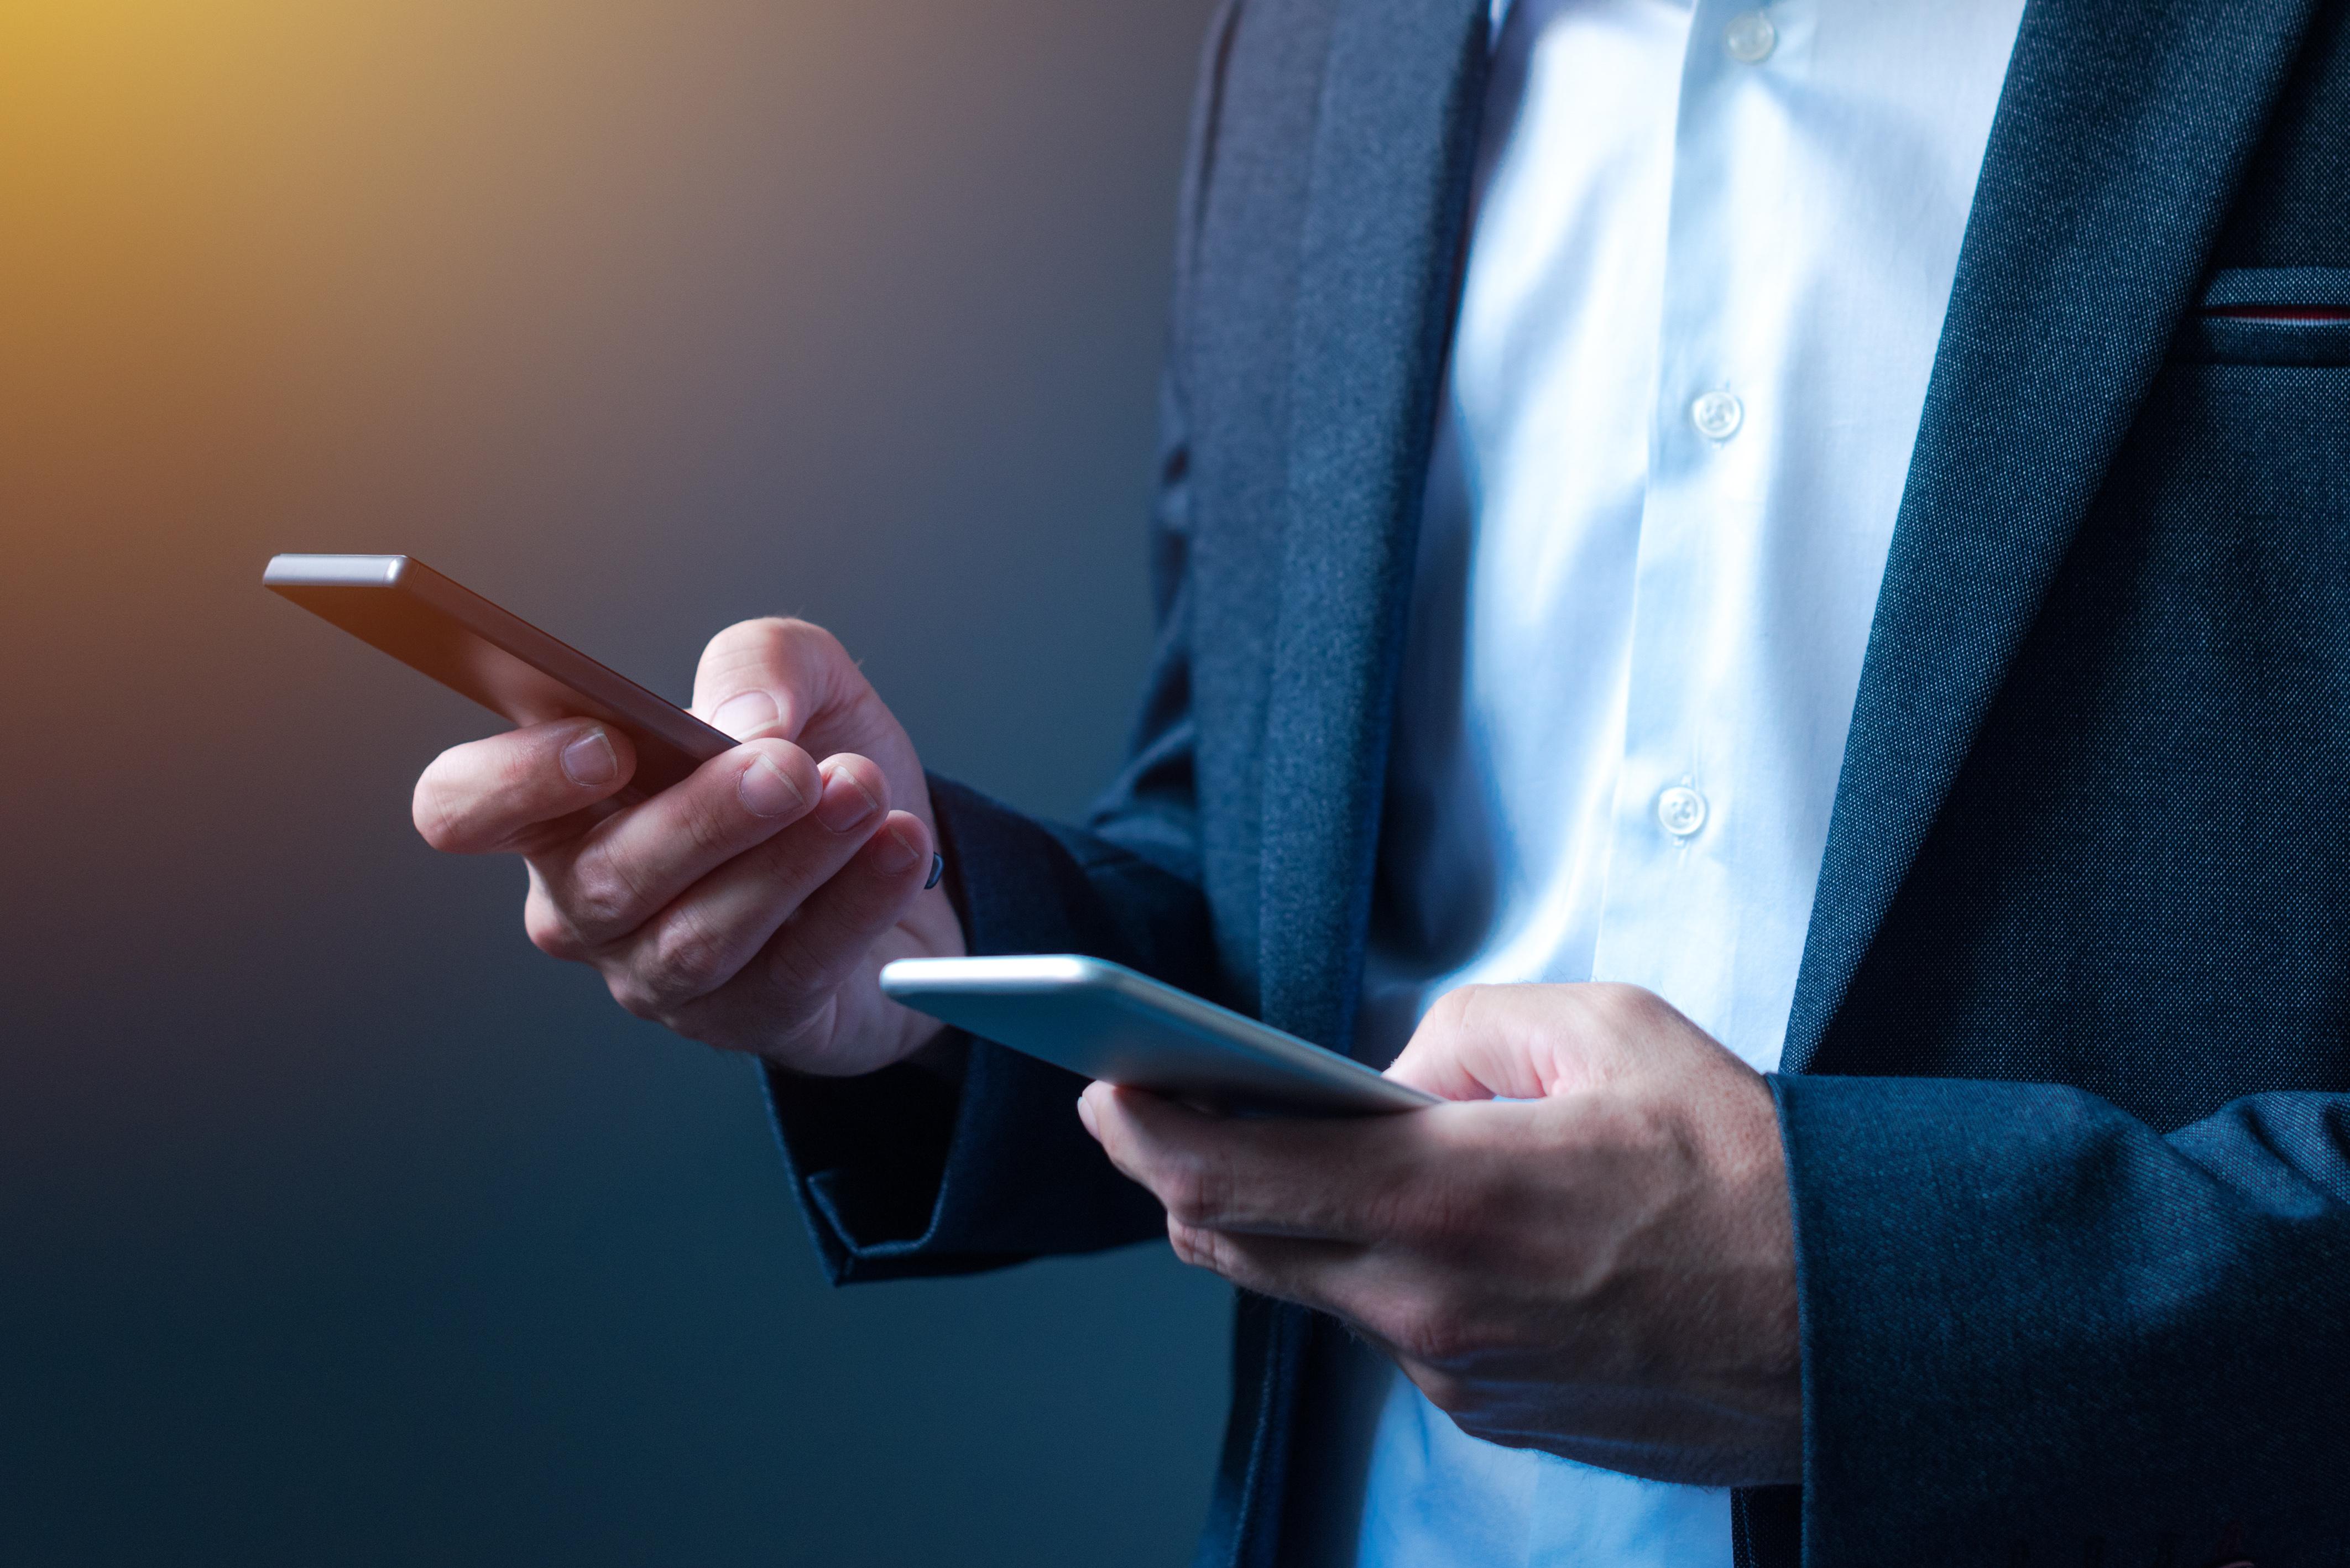 Dual SIM Phones, How Do They Work?